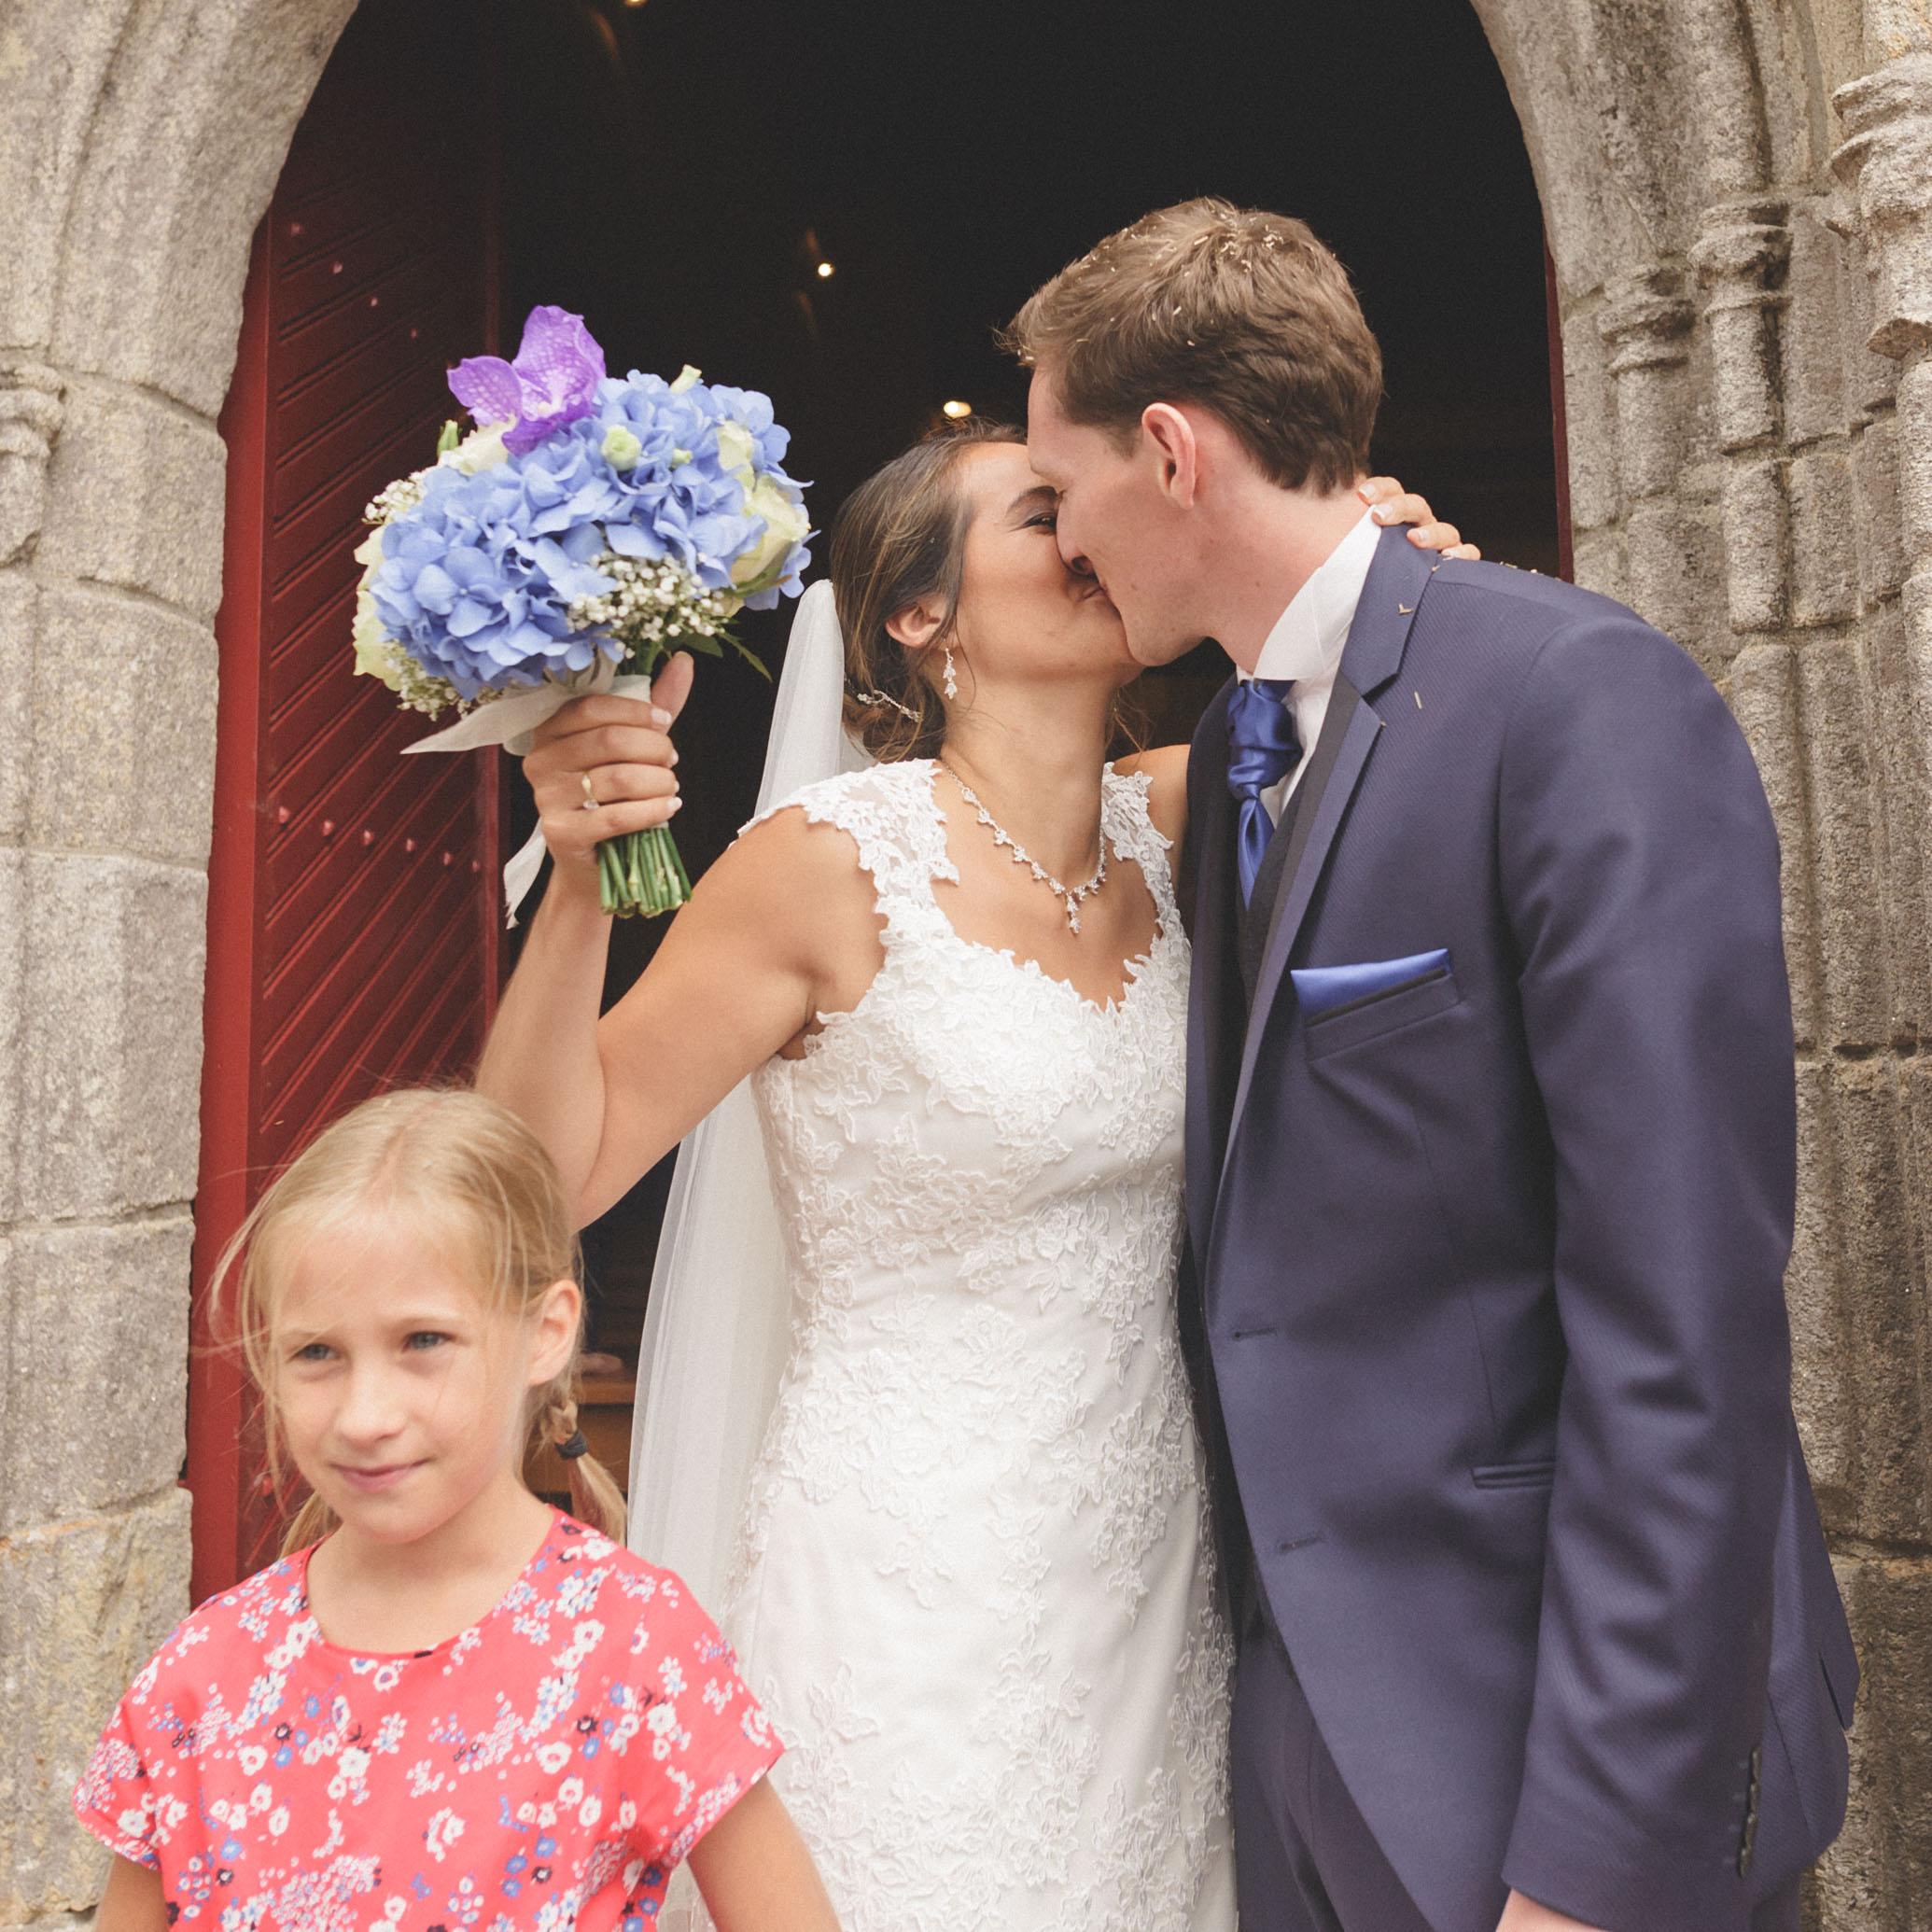 Photographie - Mariage - Bretagne - Finistere - Morbihan - Lilian Vezin Photographie (24)